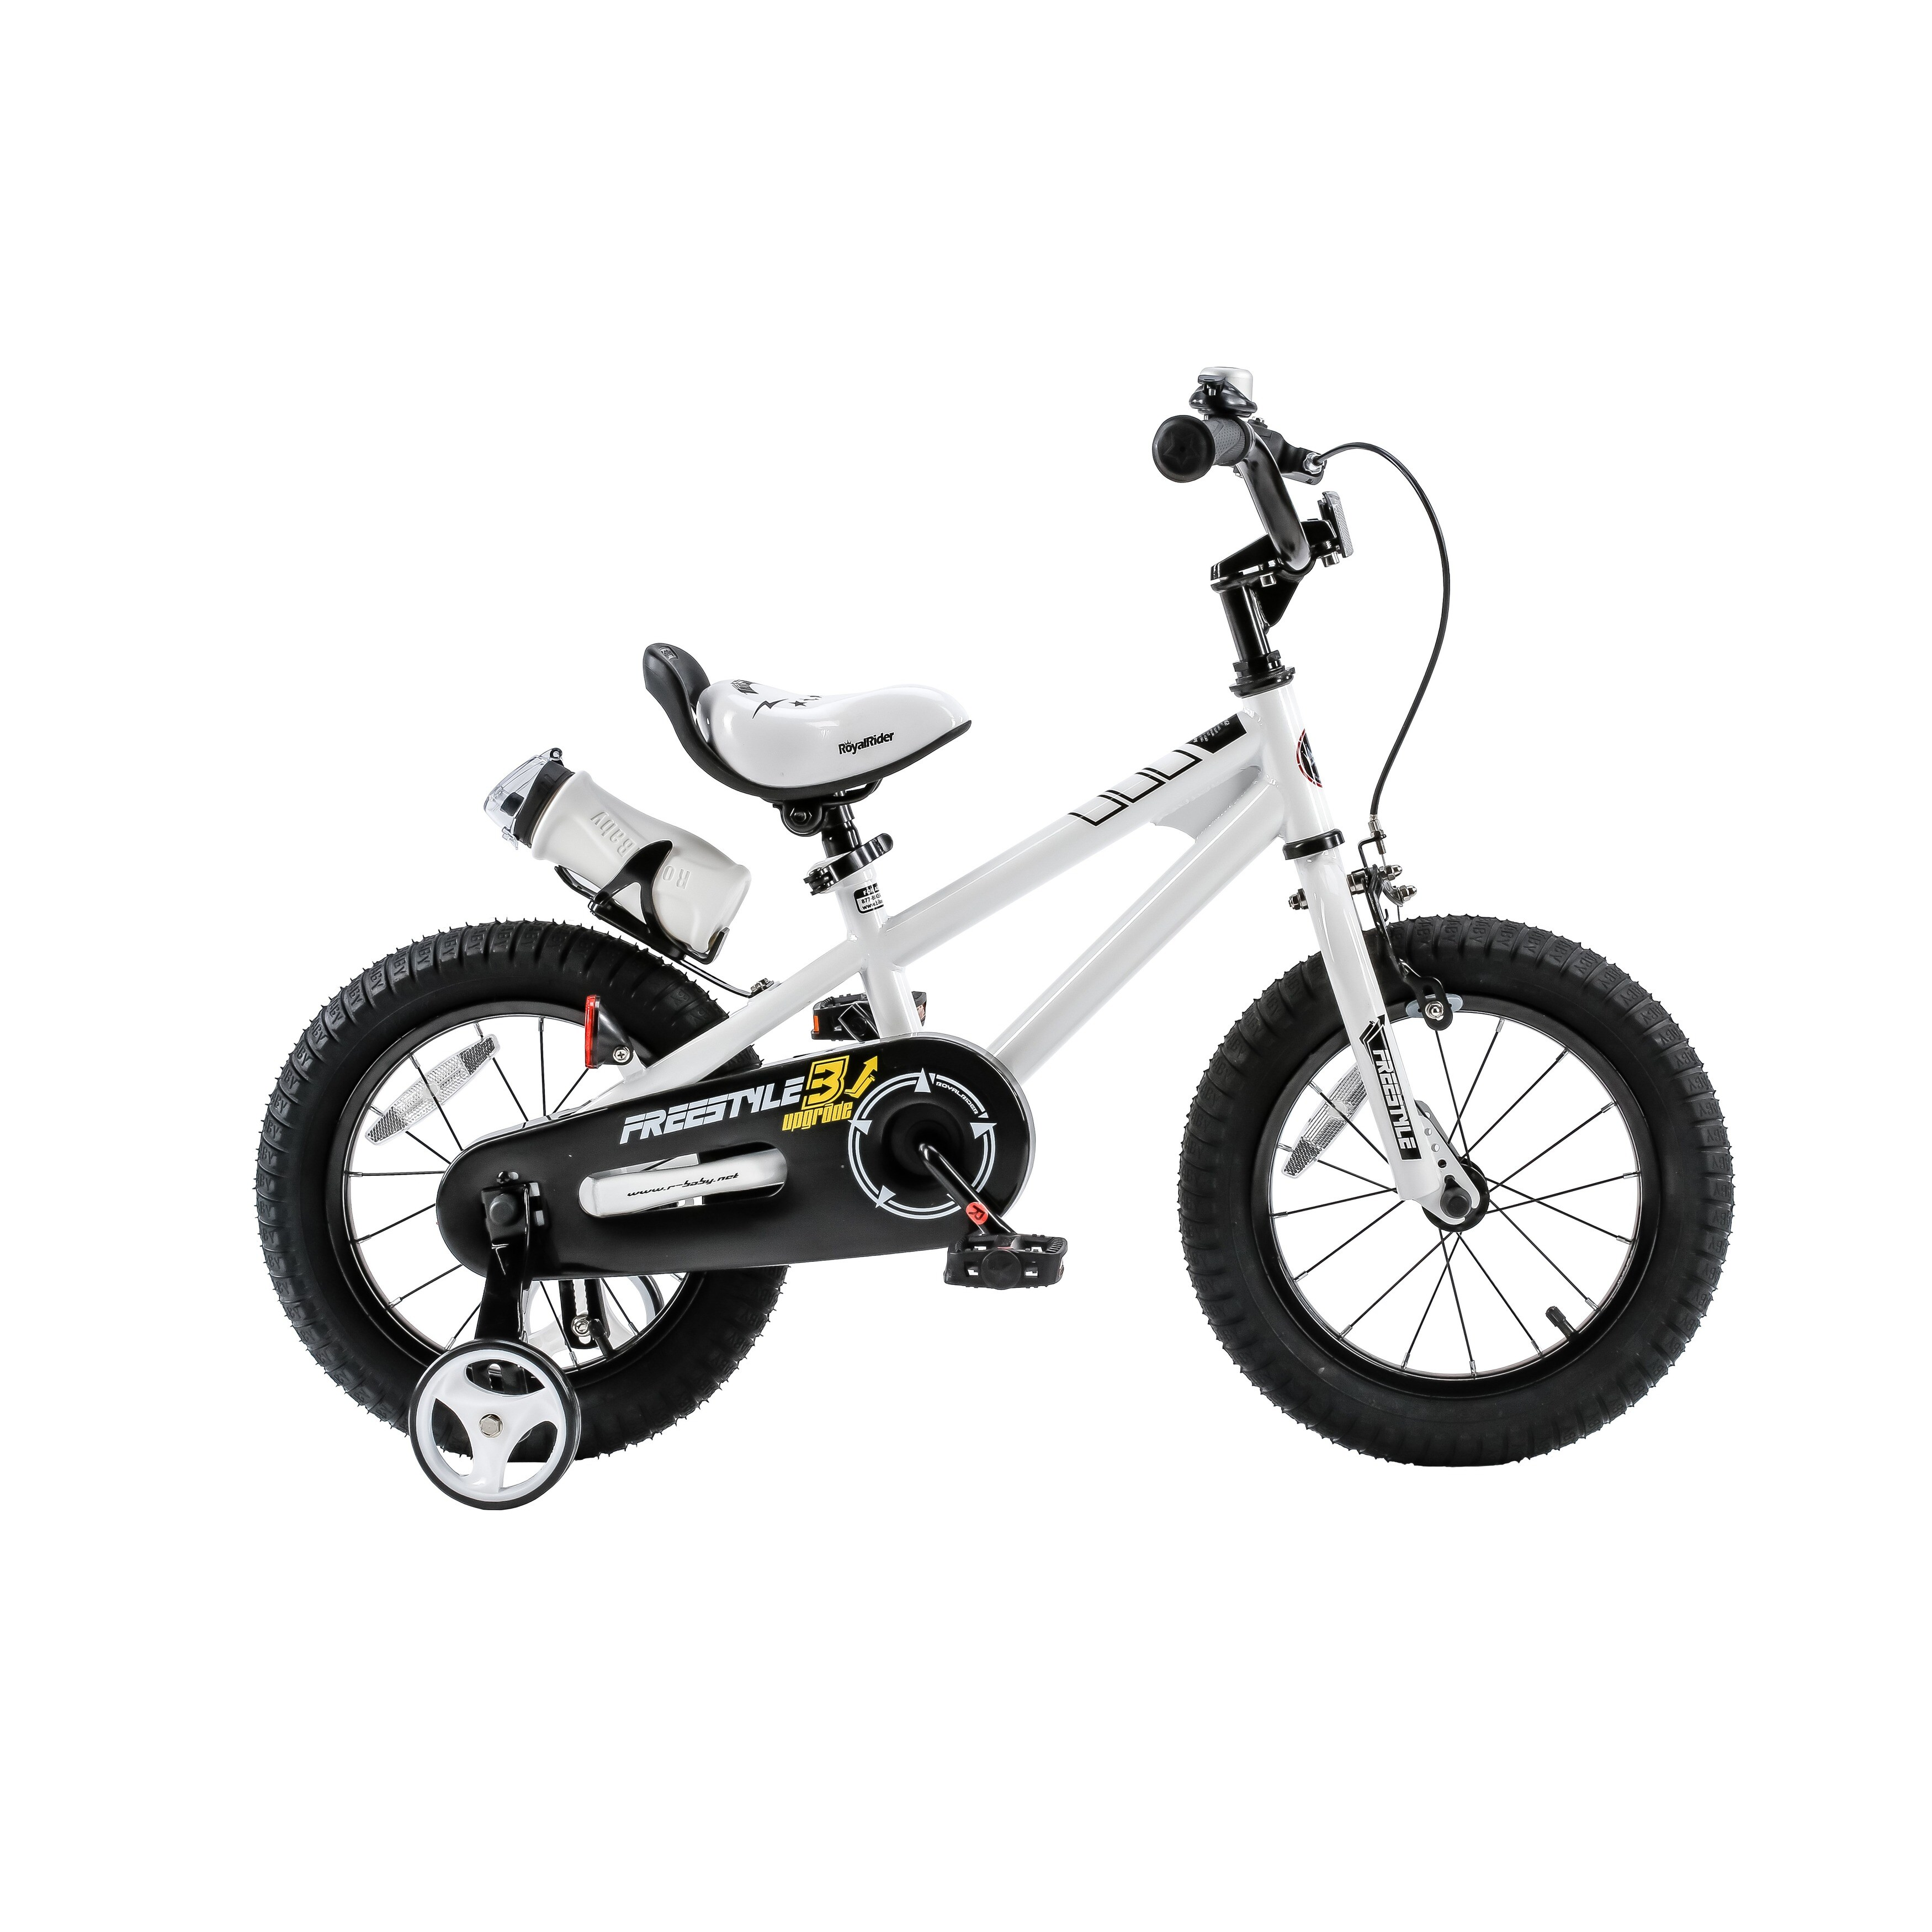 RoyalBaby BMX Freestyle 16-inch Kids' Bike With Training